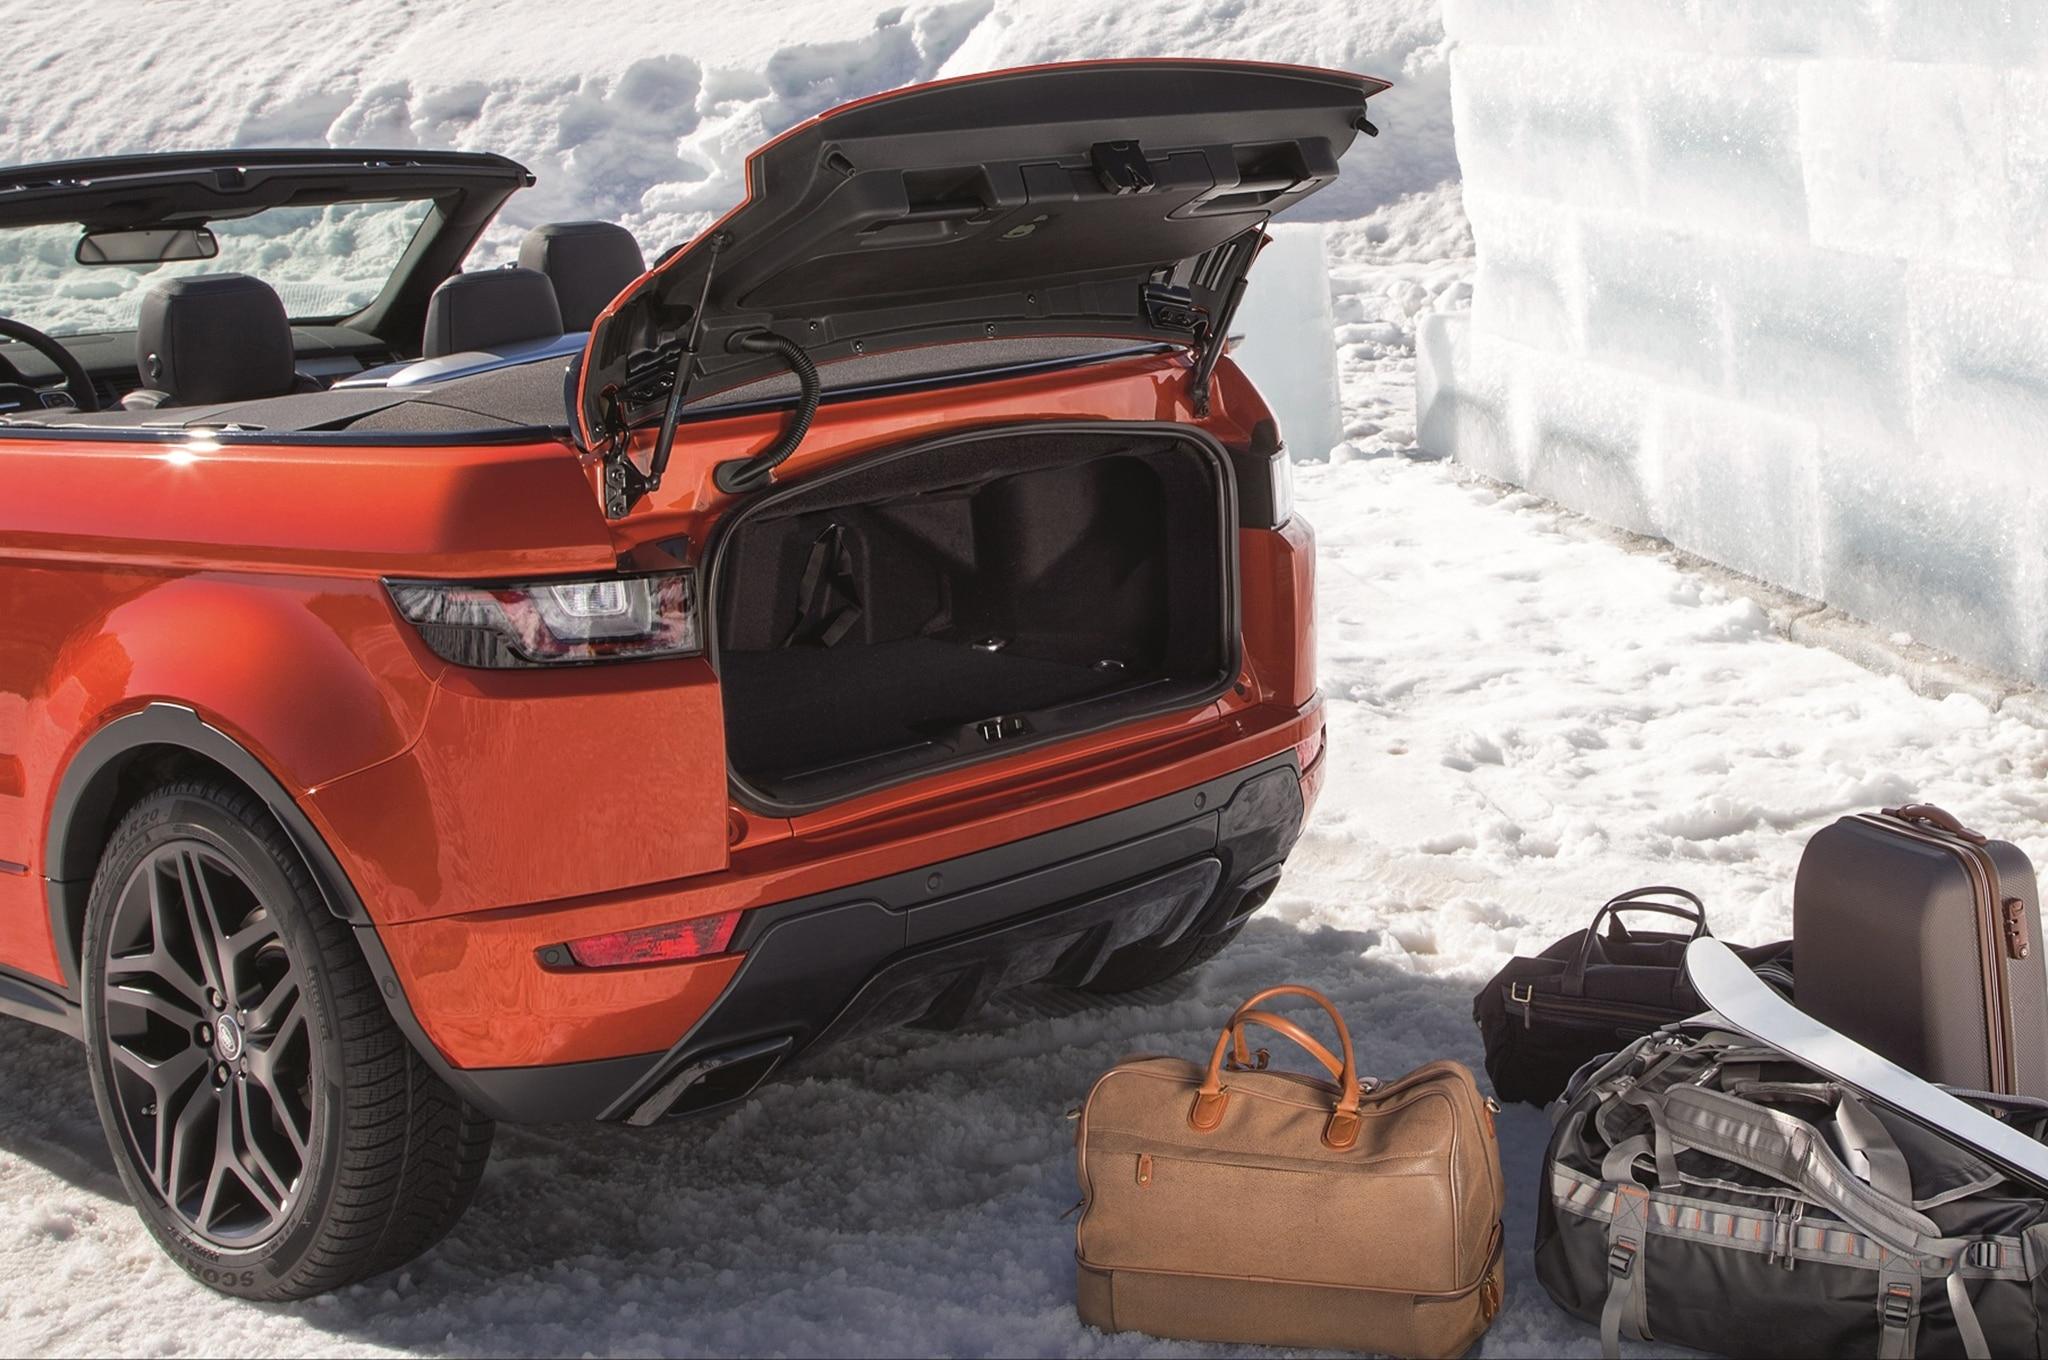 http://st.automobilemag.com/uploads/sites/11/2015/11/2017-Land-Rover-Range-Rover-Evoque-convertible-trunk-31.jpg